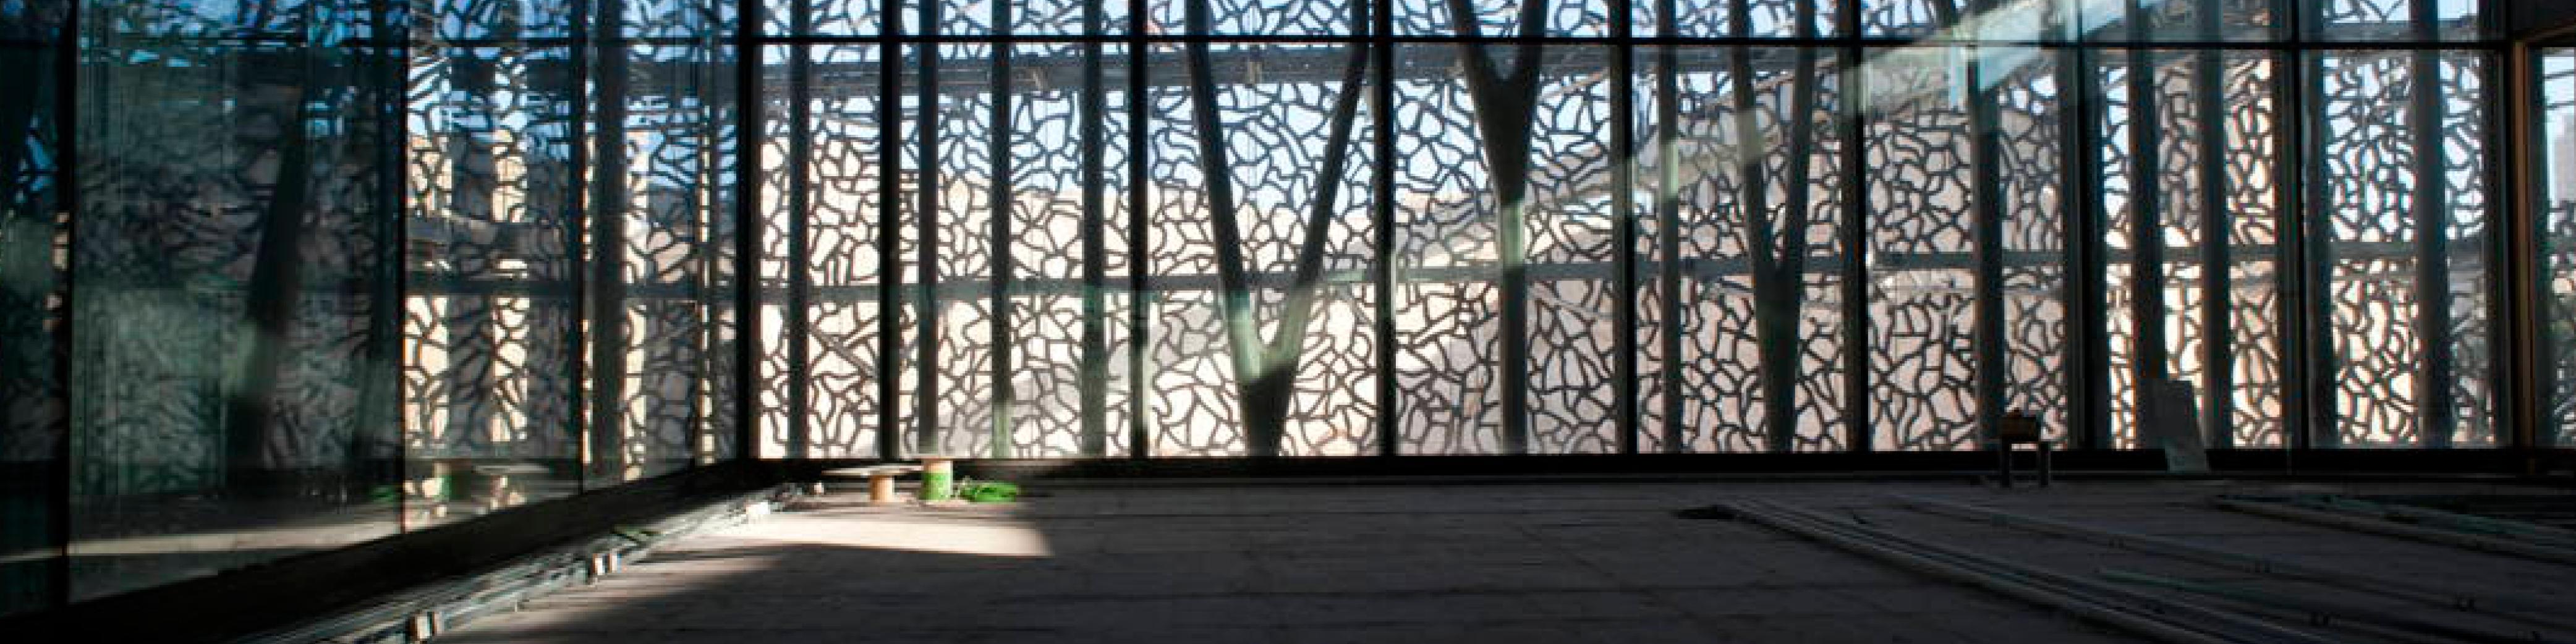 Texas Interior Design, Architecture & Landscape Architecture Continuing Education Requirements